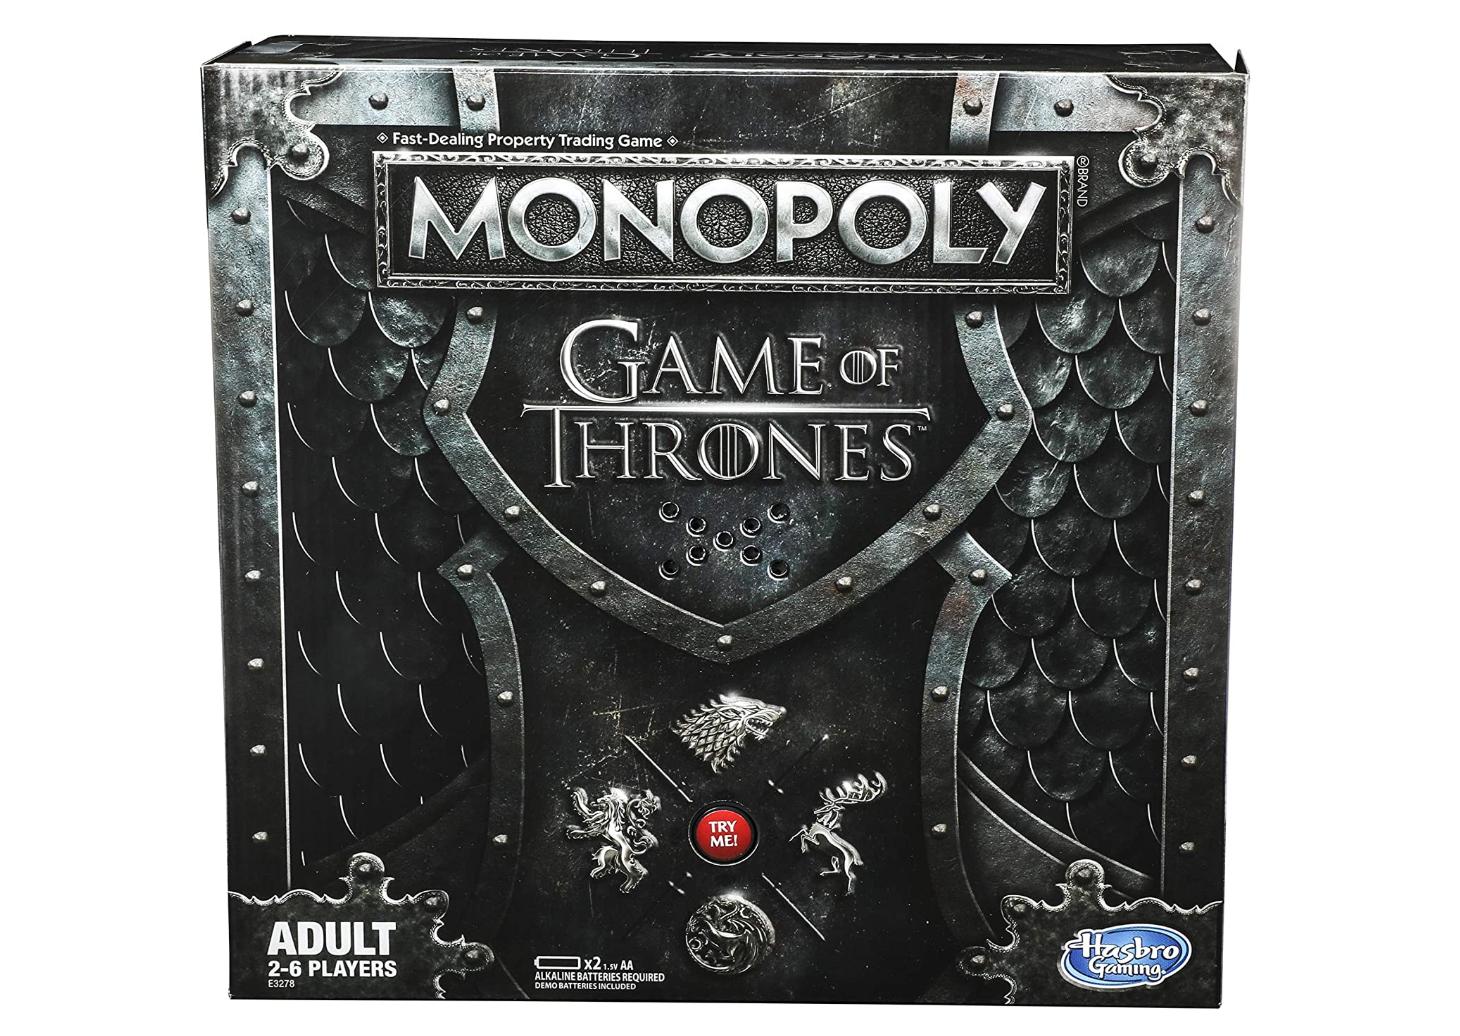 quarantine game of thrones monopoly